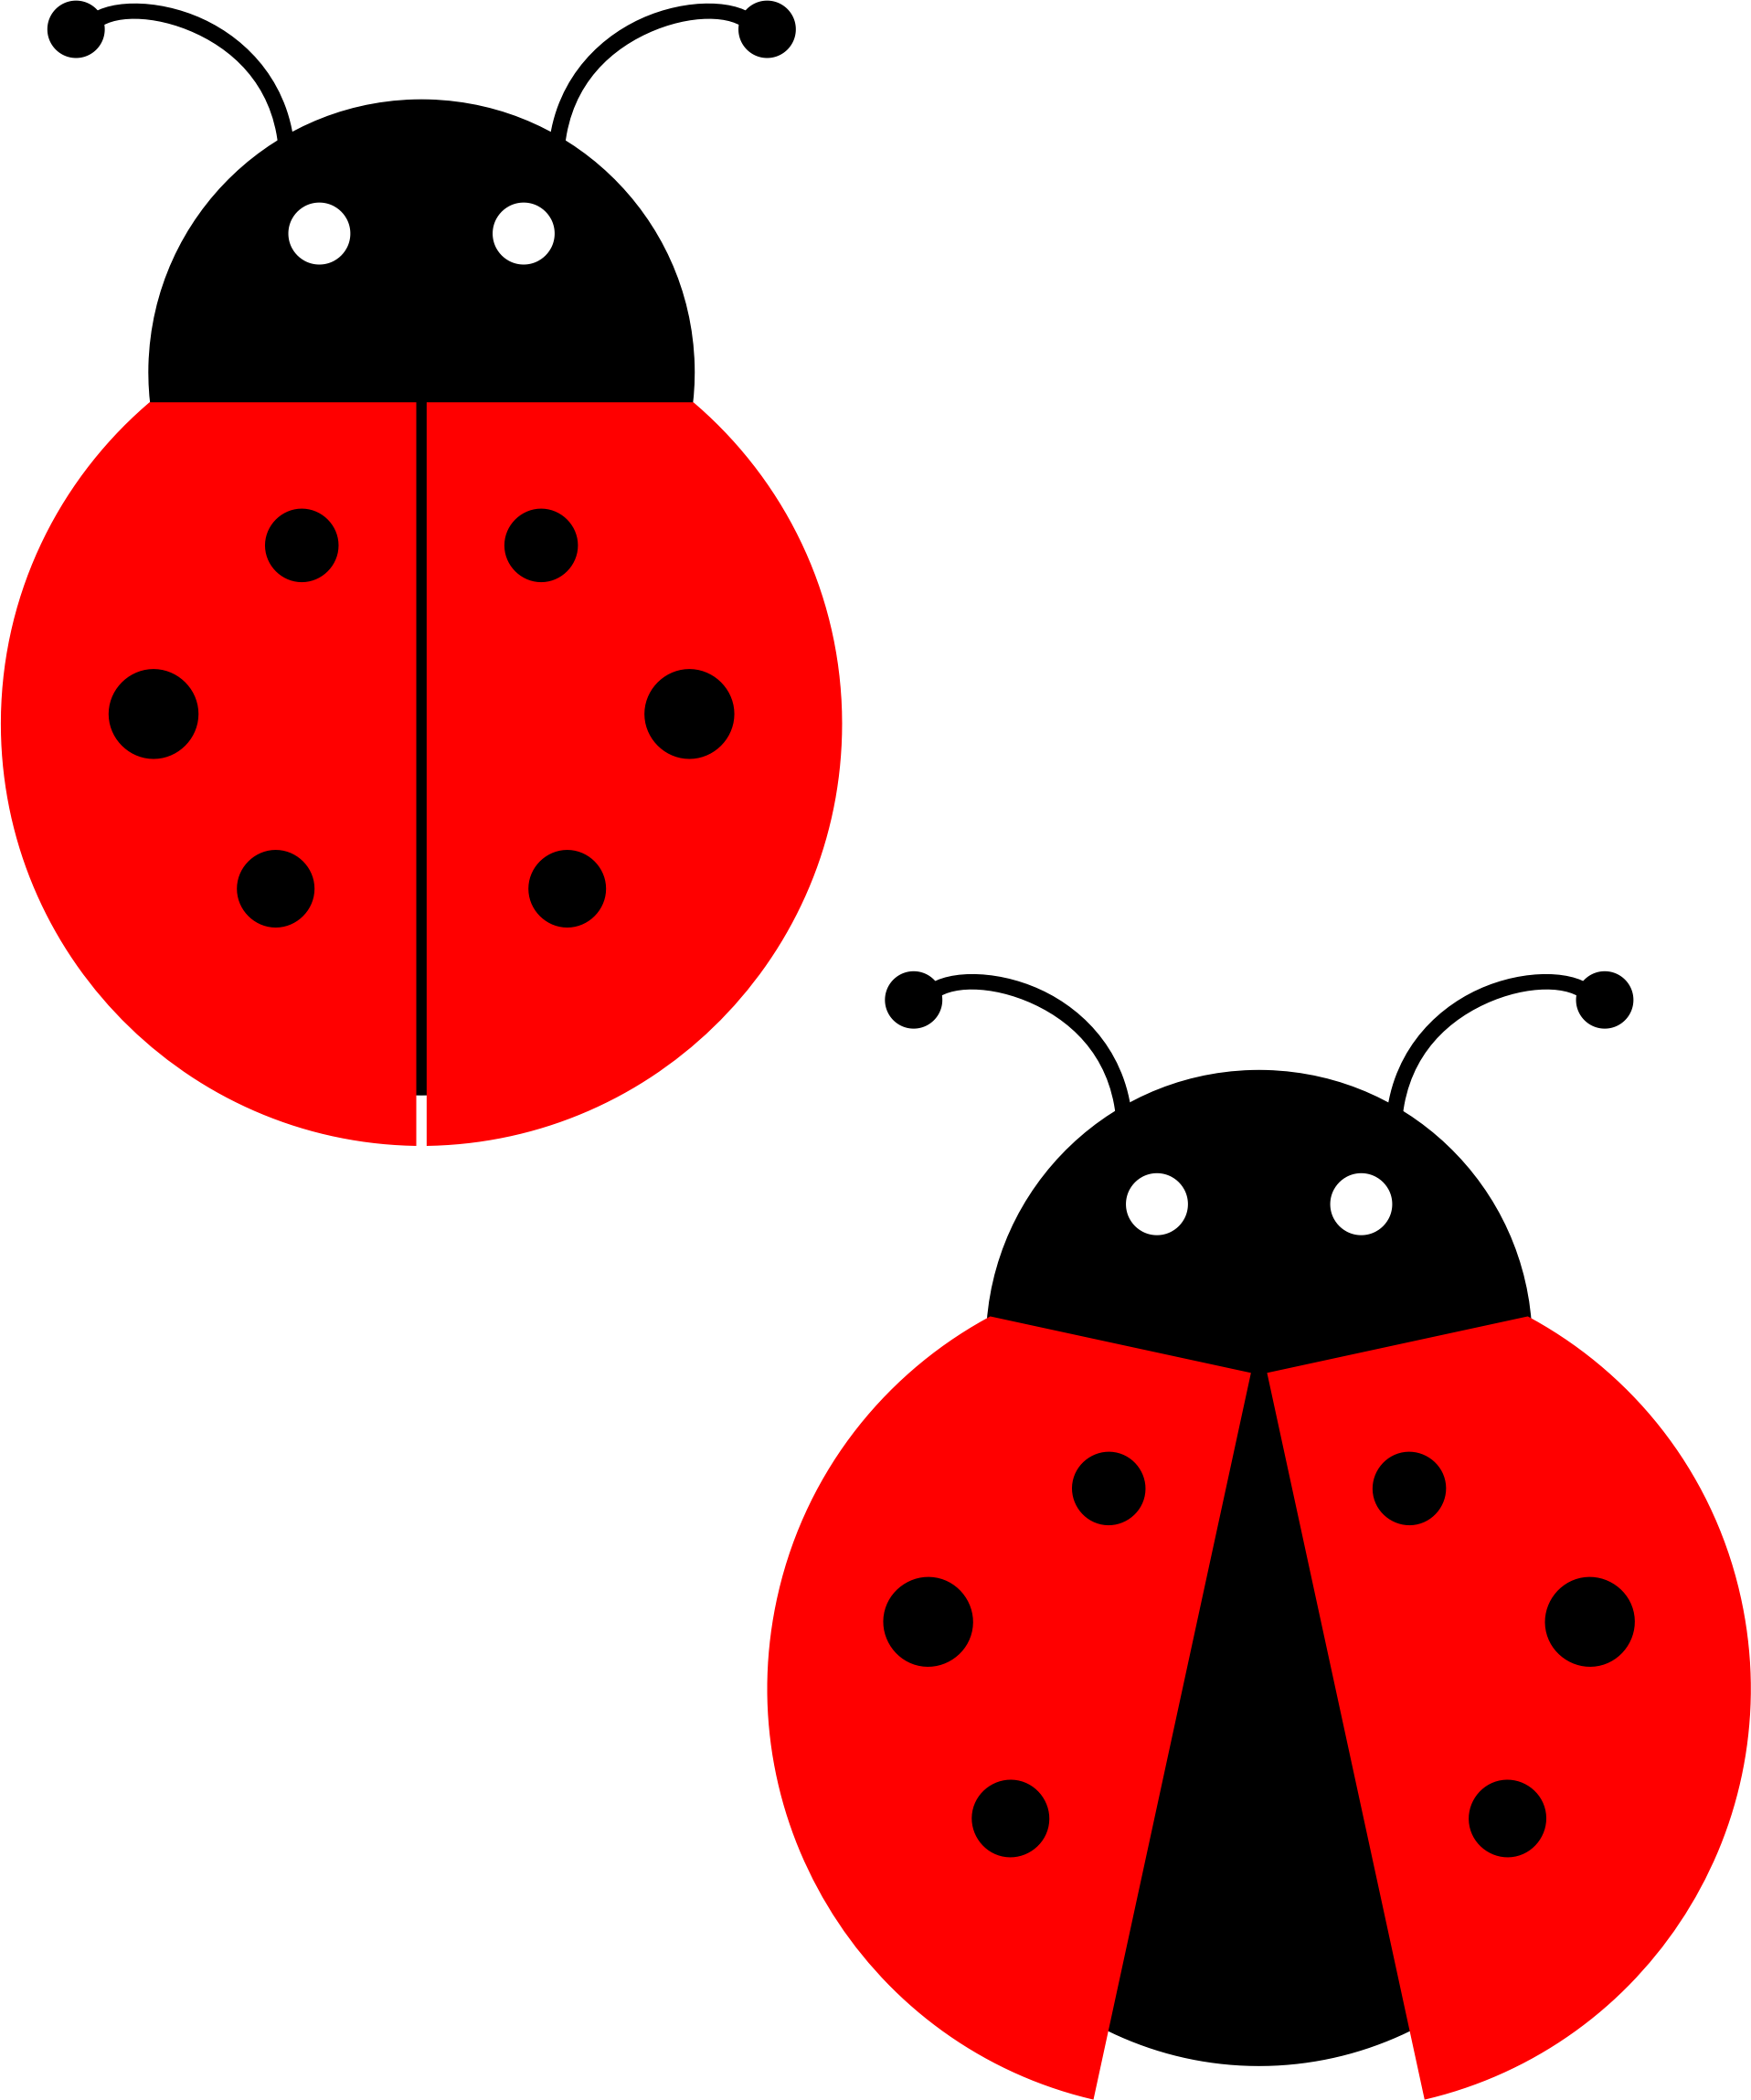 Ladybug by ziggystar